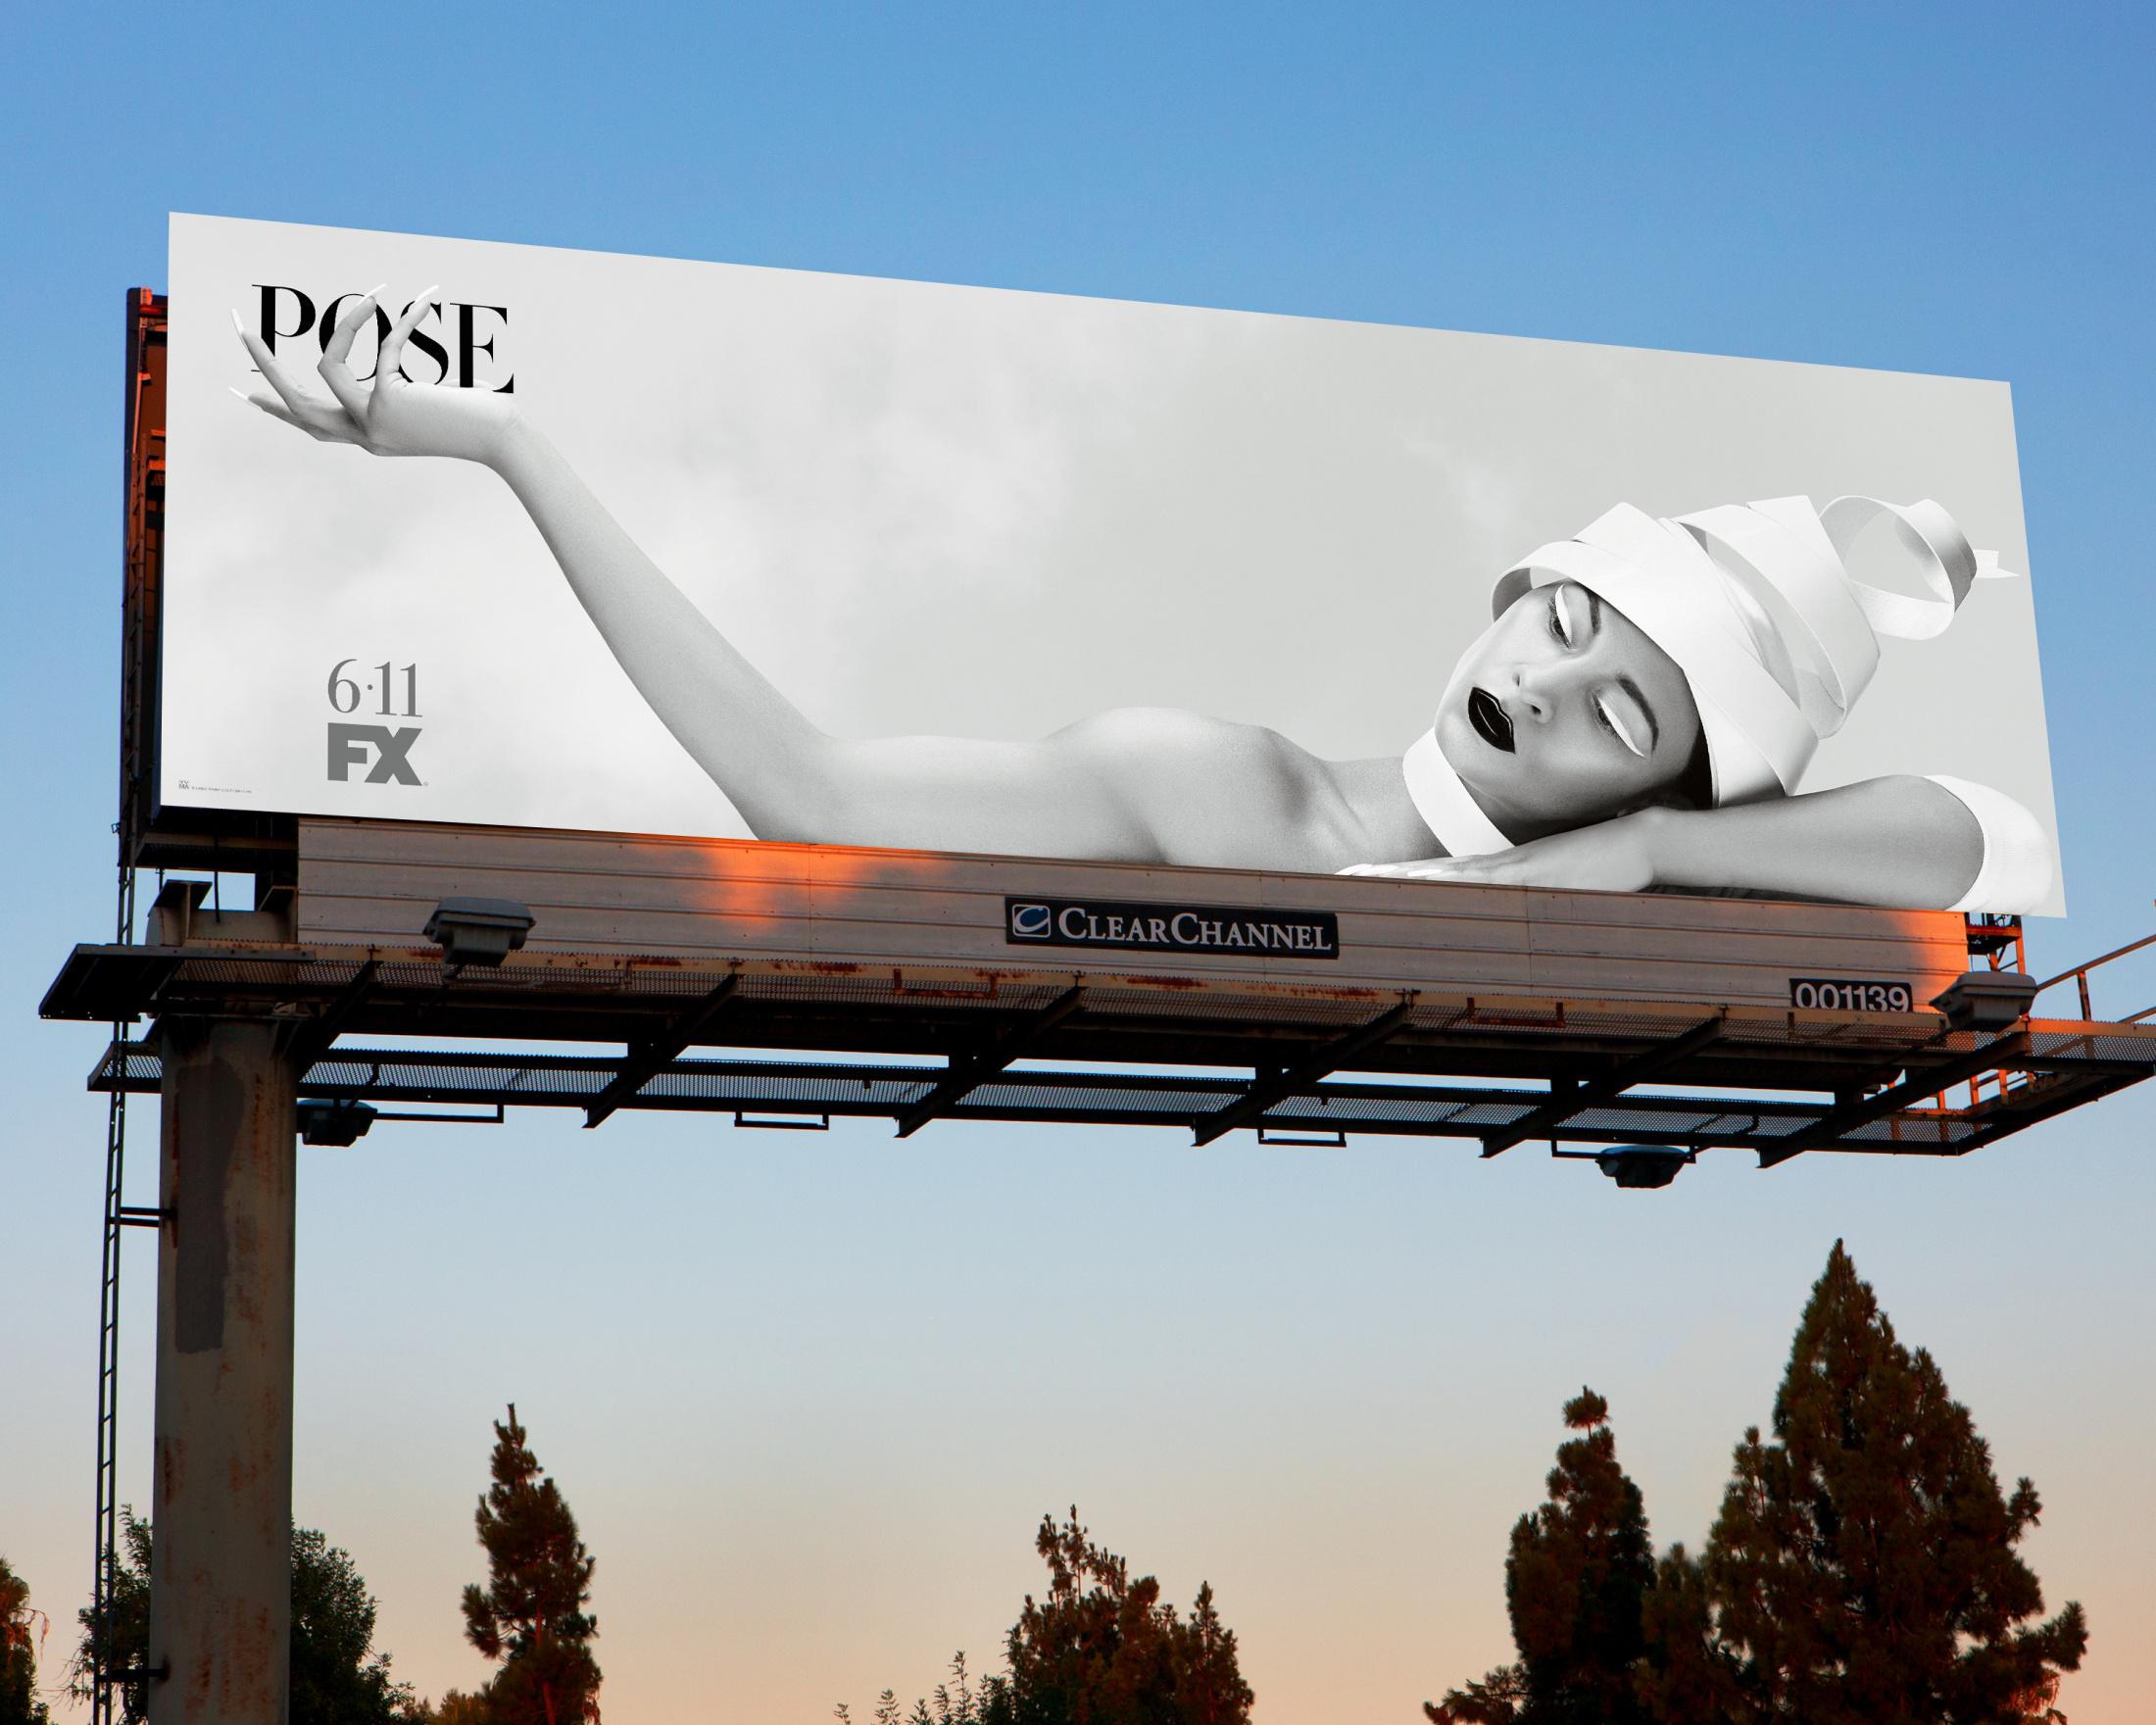 Thumbnail for Pose - Blanca Billboard